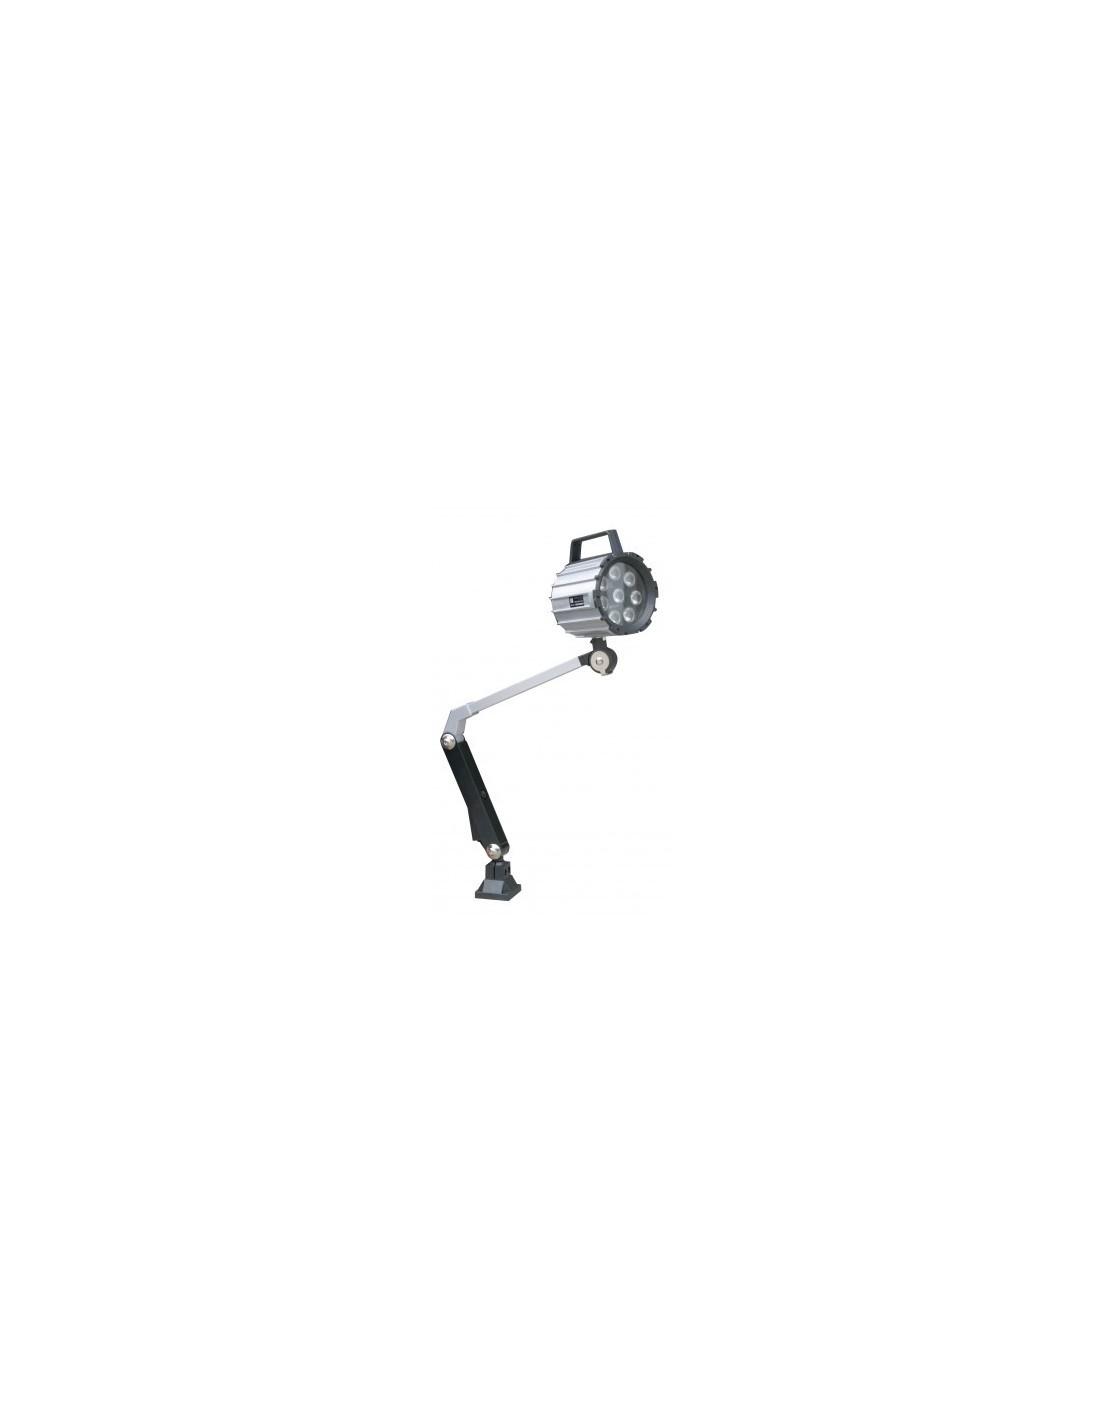 Lampa cu brat articulat Optimum LED 8 - 720